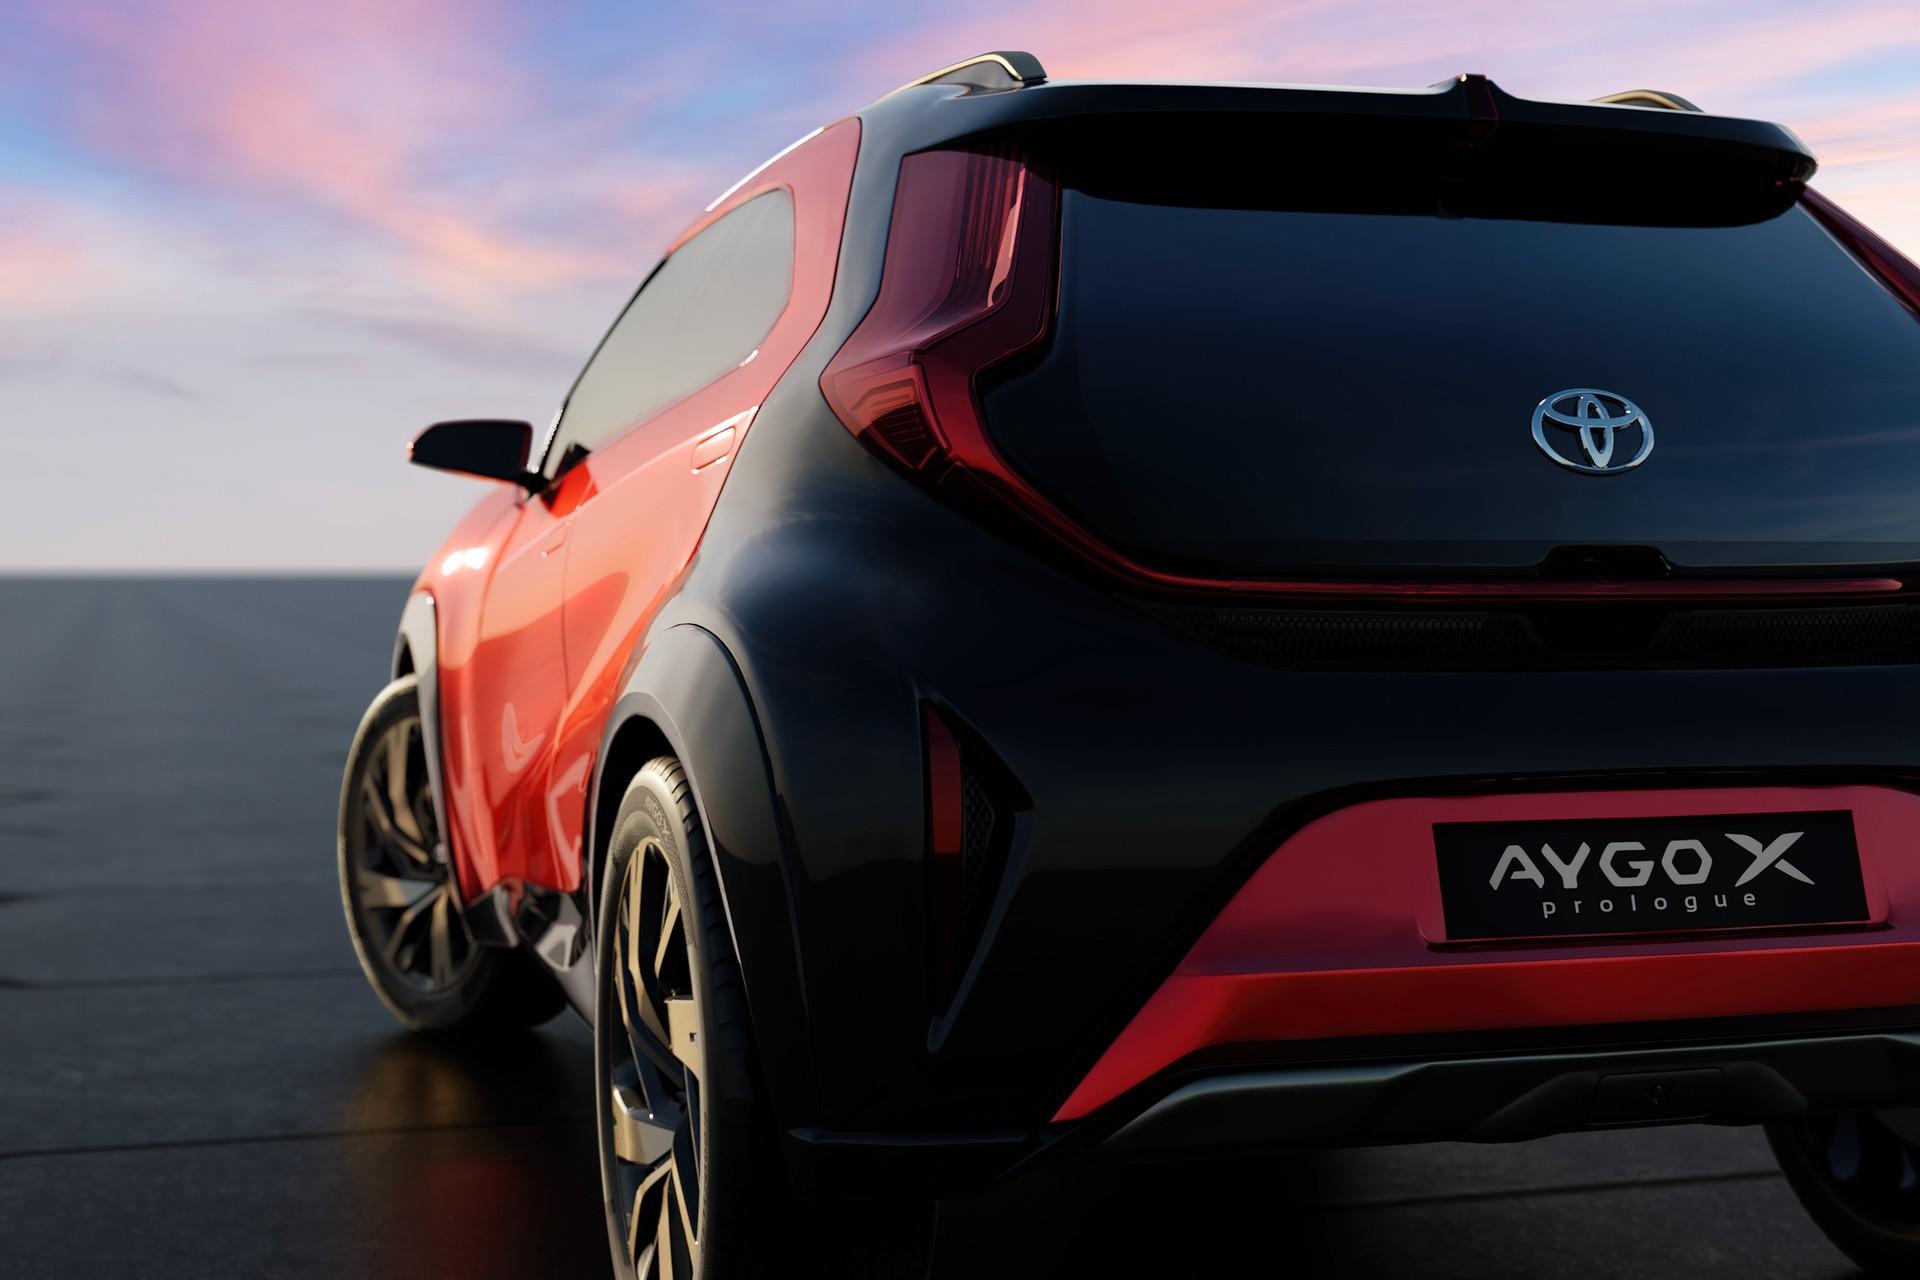 Toyota_Aygo_X_prologue-0013